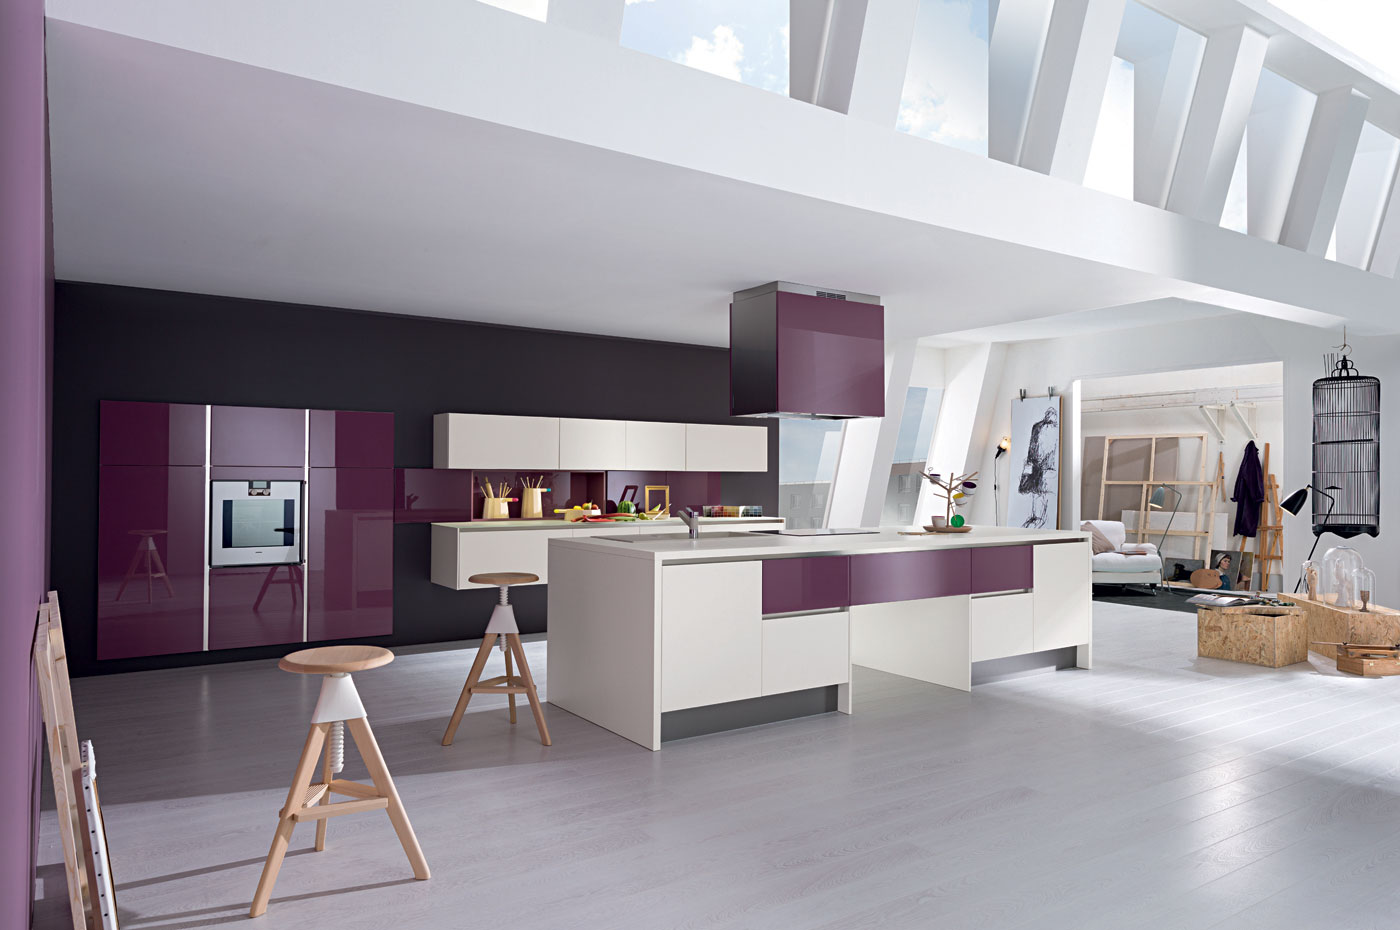 perene lyon amazing perene lyon image may contain indoor with perene lyon with perene lyon. Black Bedroom Furniture Sets. Home Design Ideas